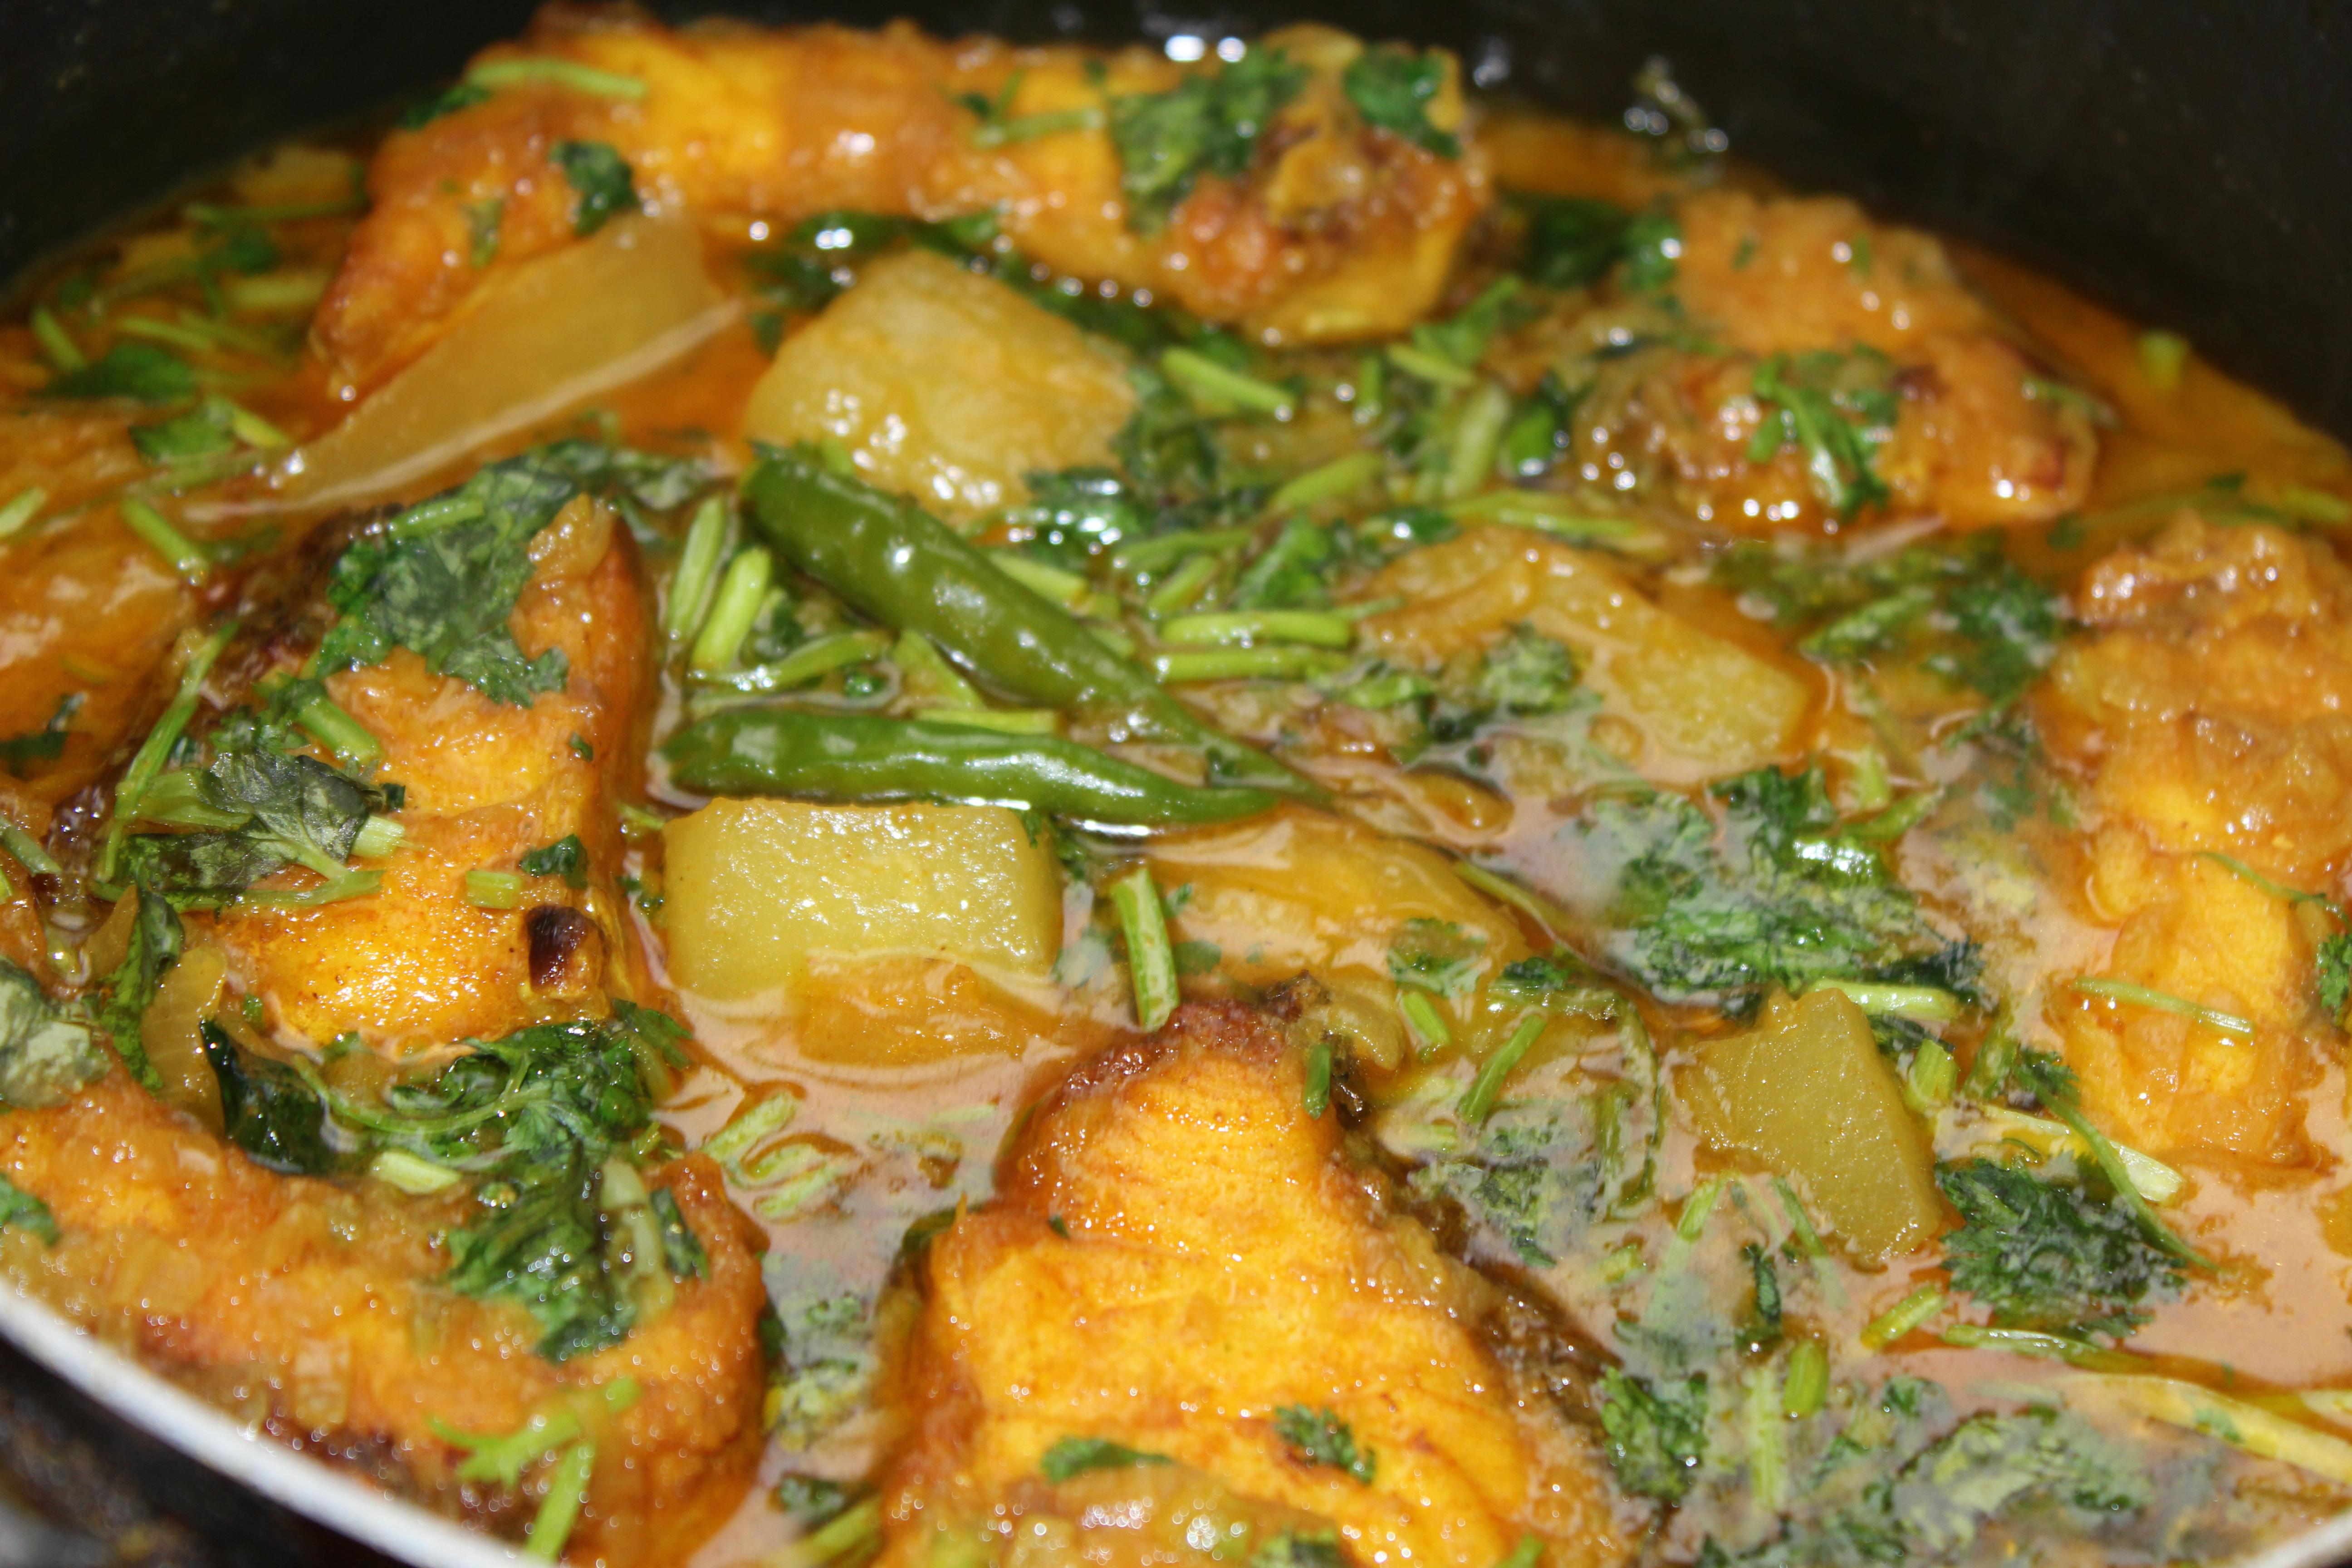 Rohu Fish With Green Papaya Pepe Diye Rui Macher Jhol on Cut Paste Goat